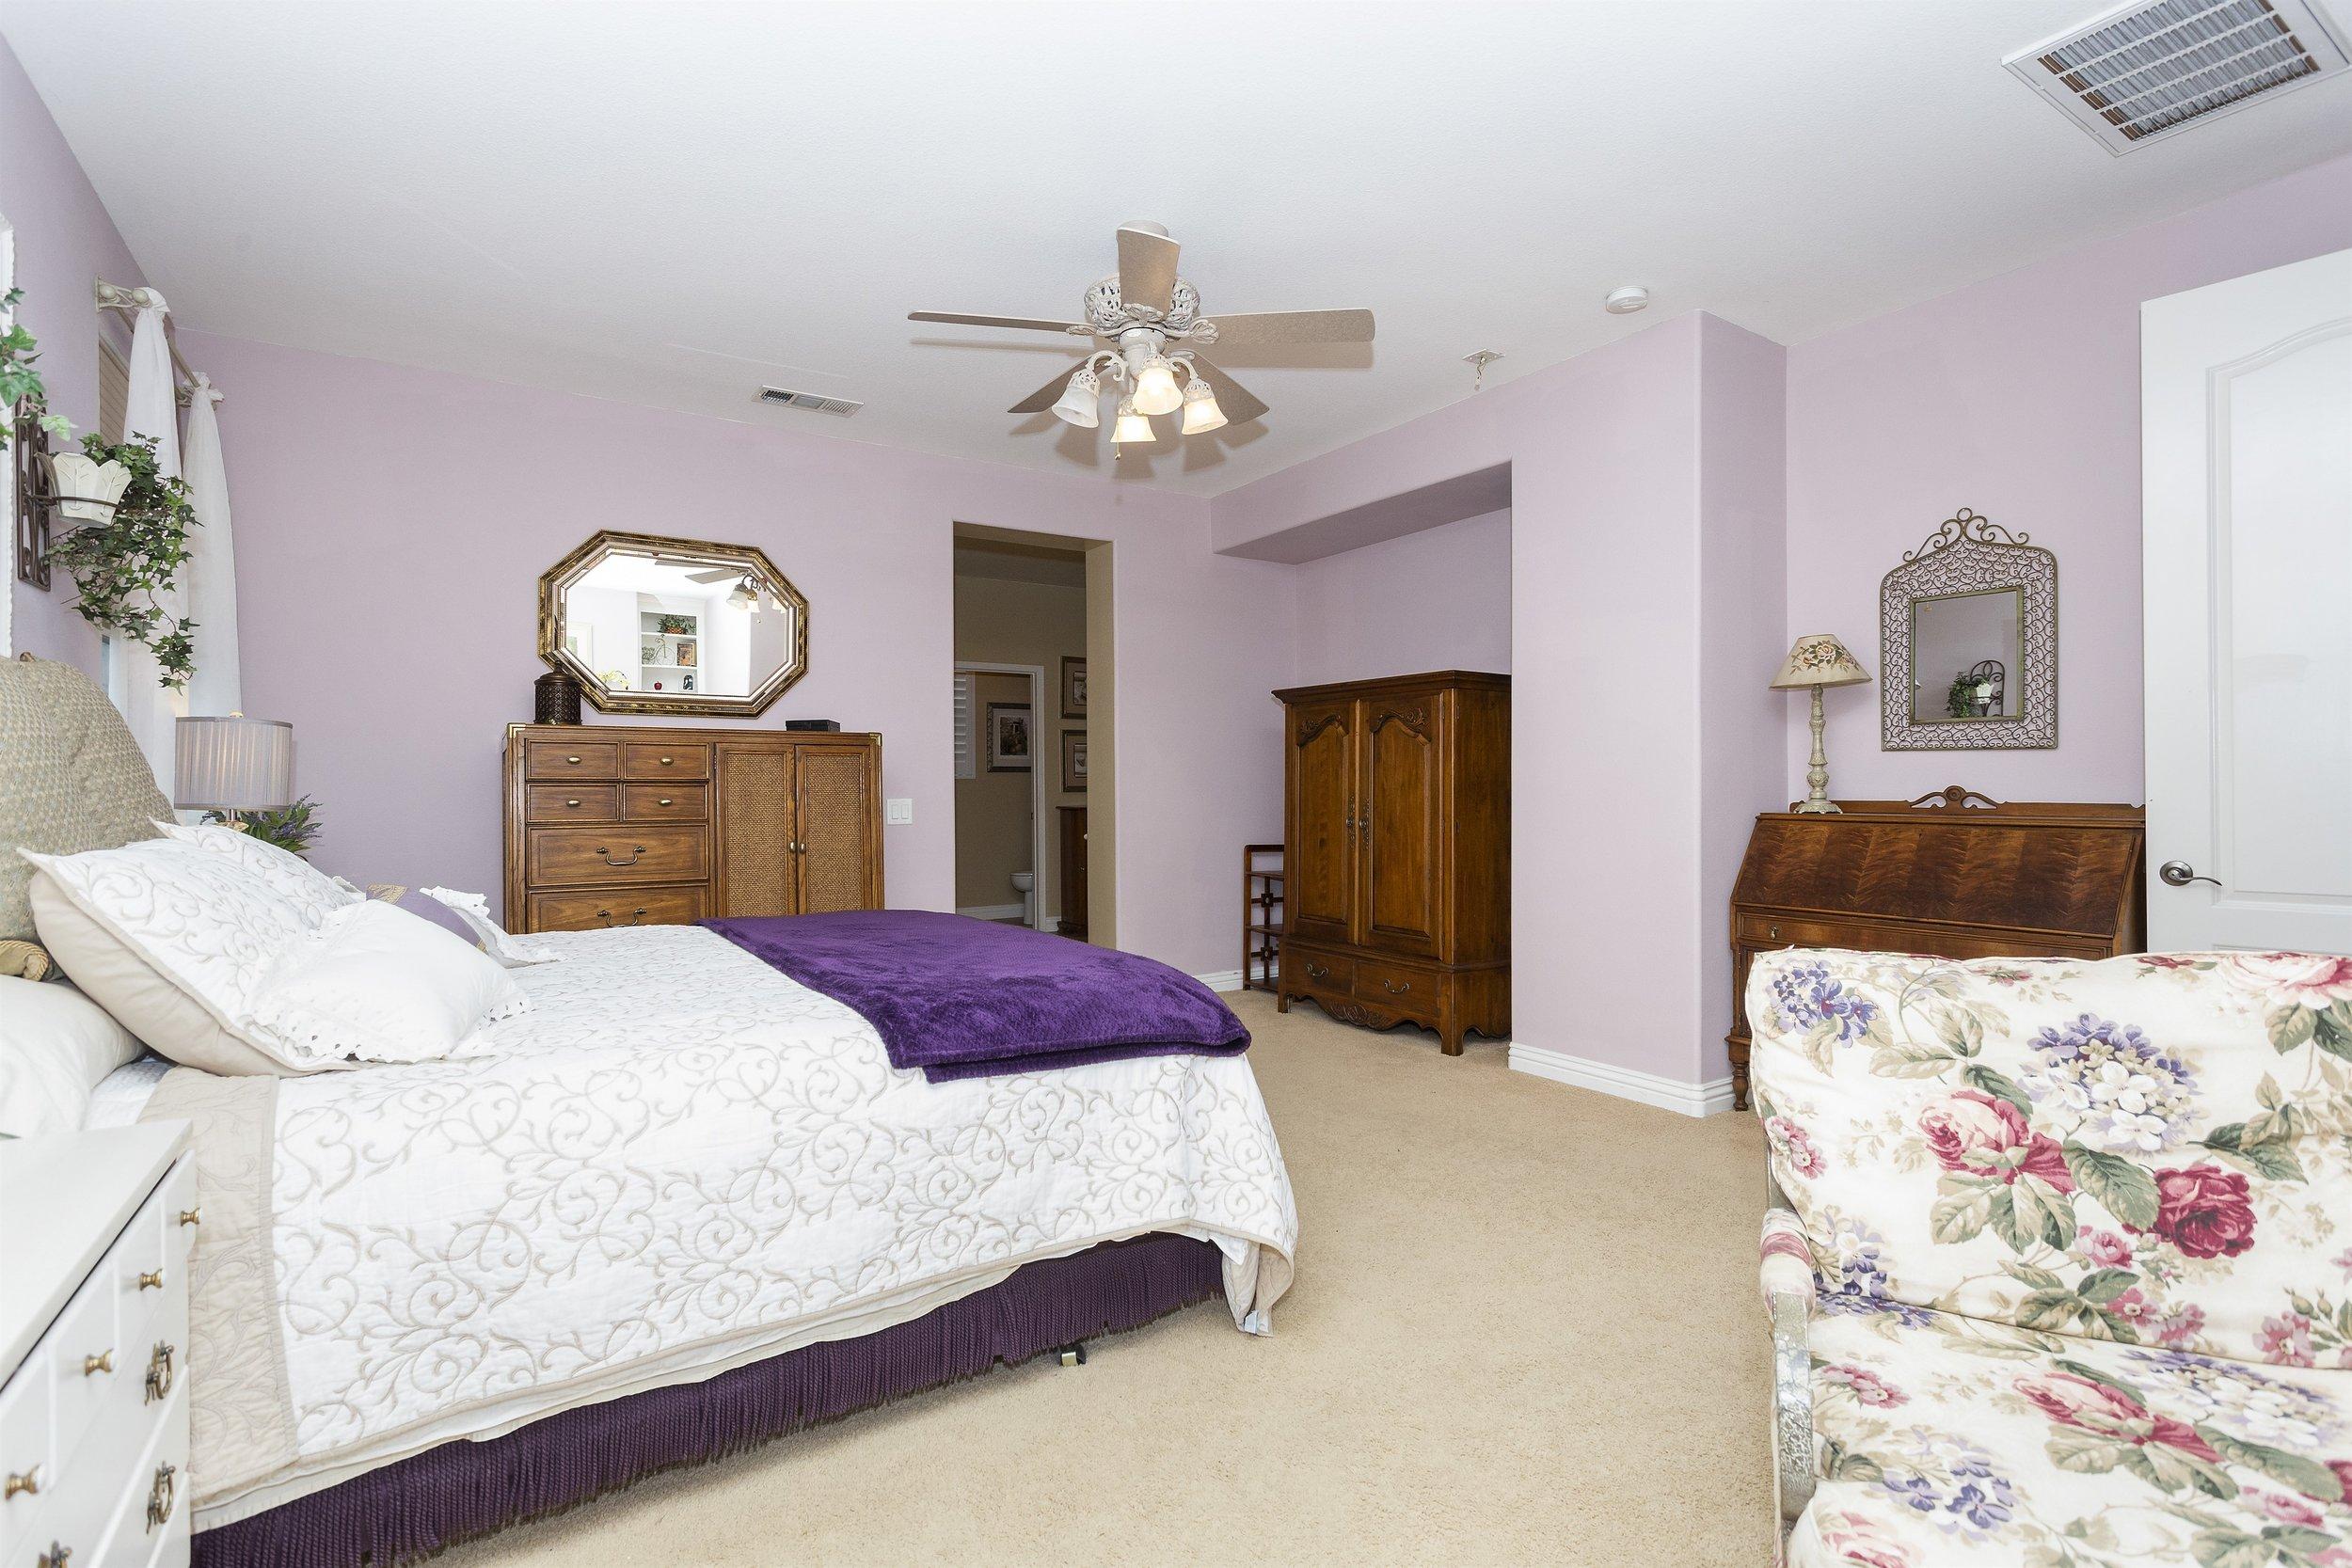 038_2nd Floor Master Bedroom.jpg